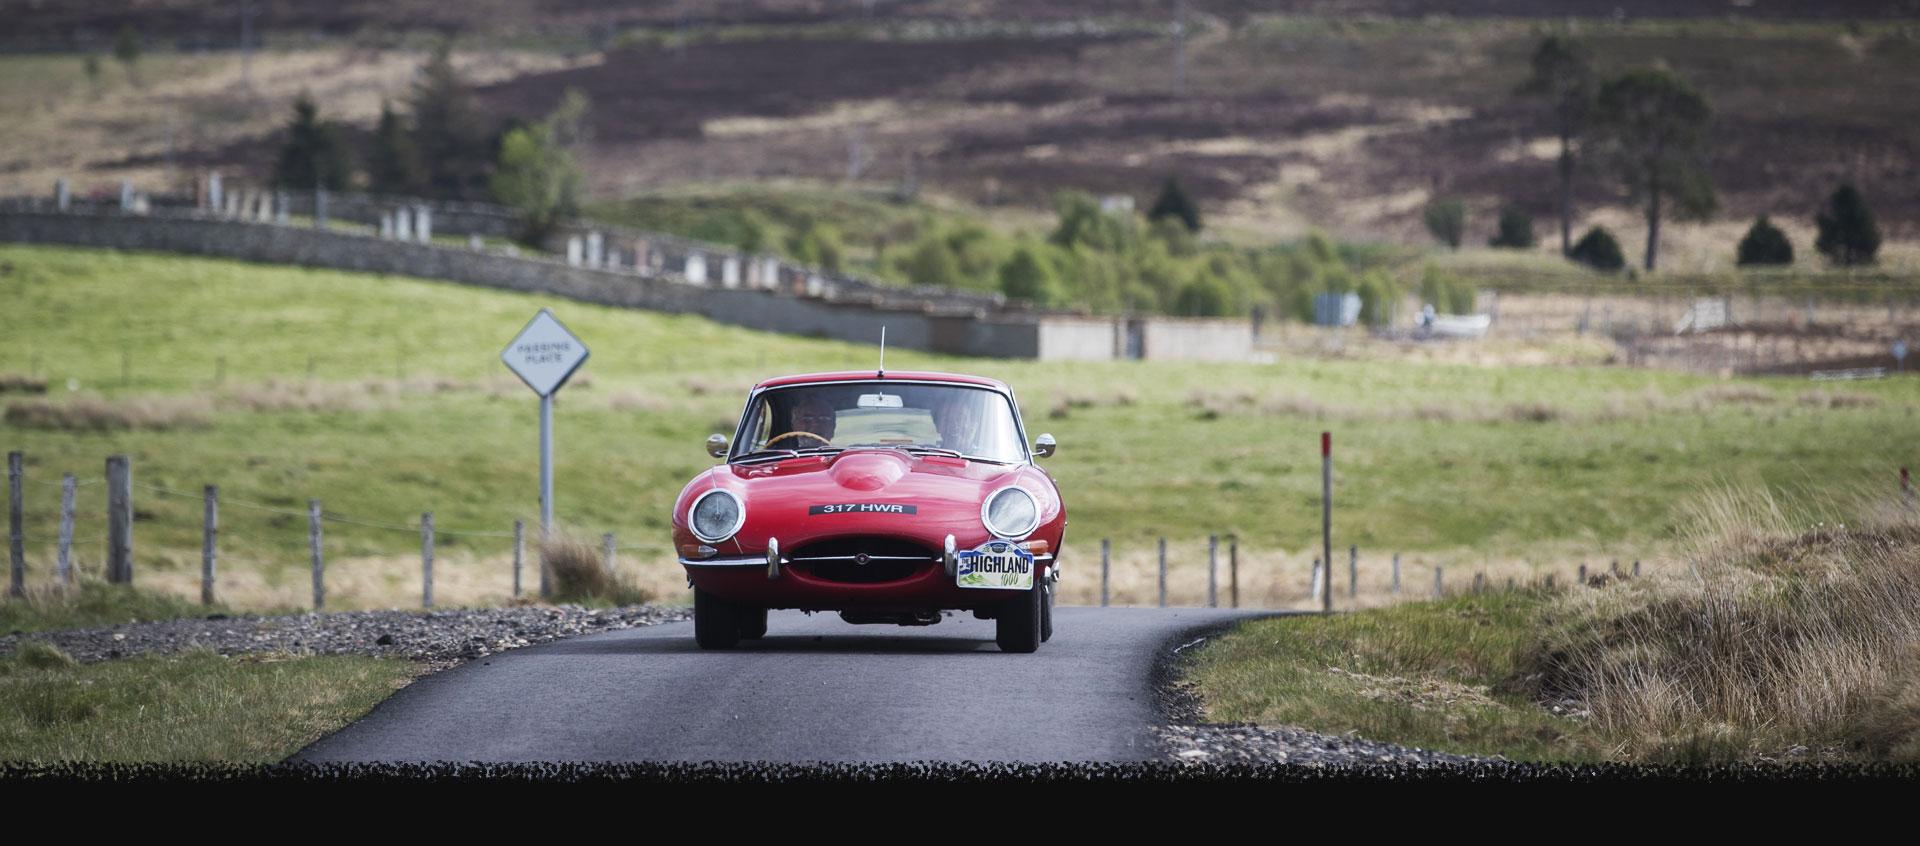 Bespoke Rallies | Classic Car Rallies & Touring Events